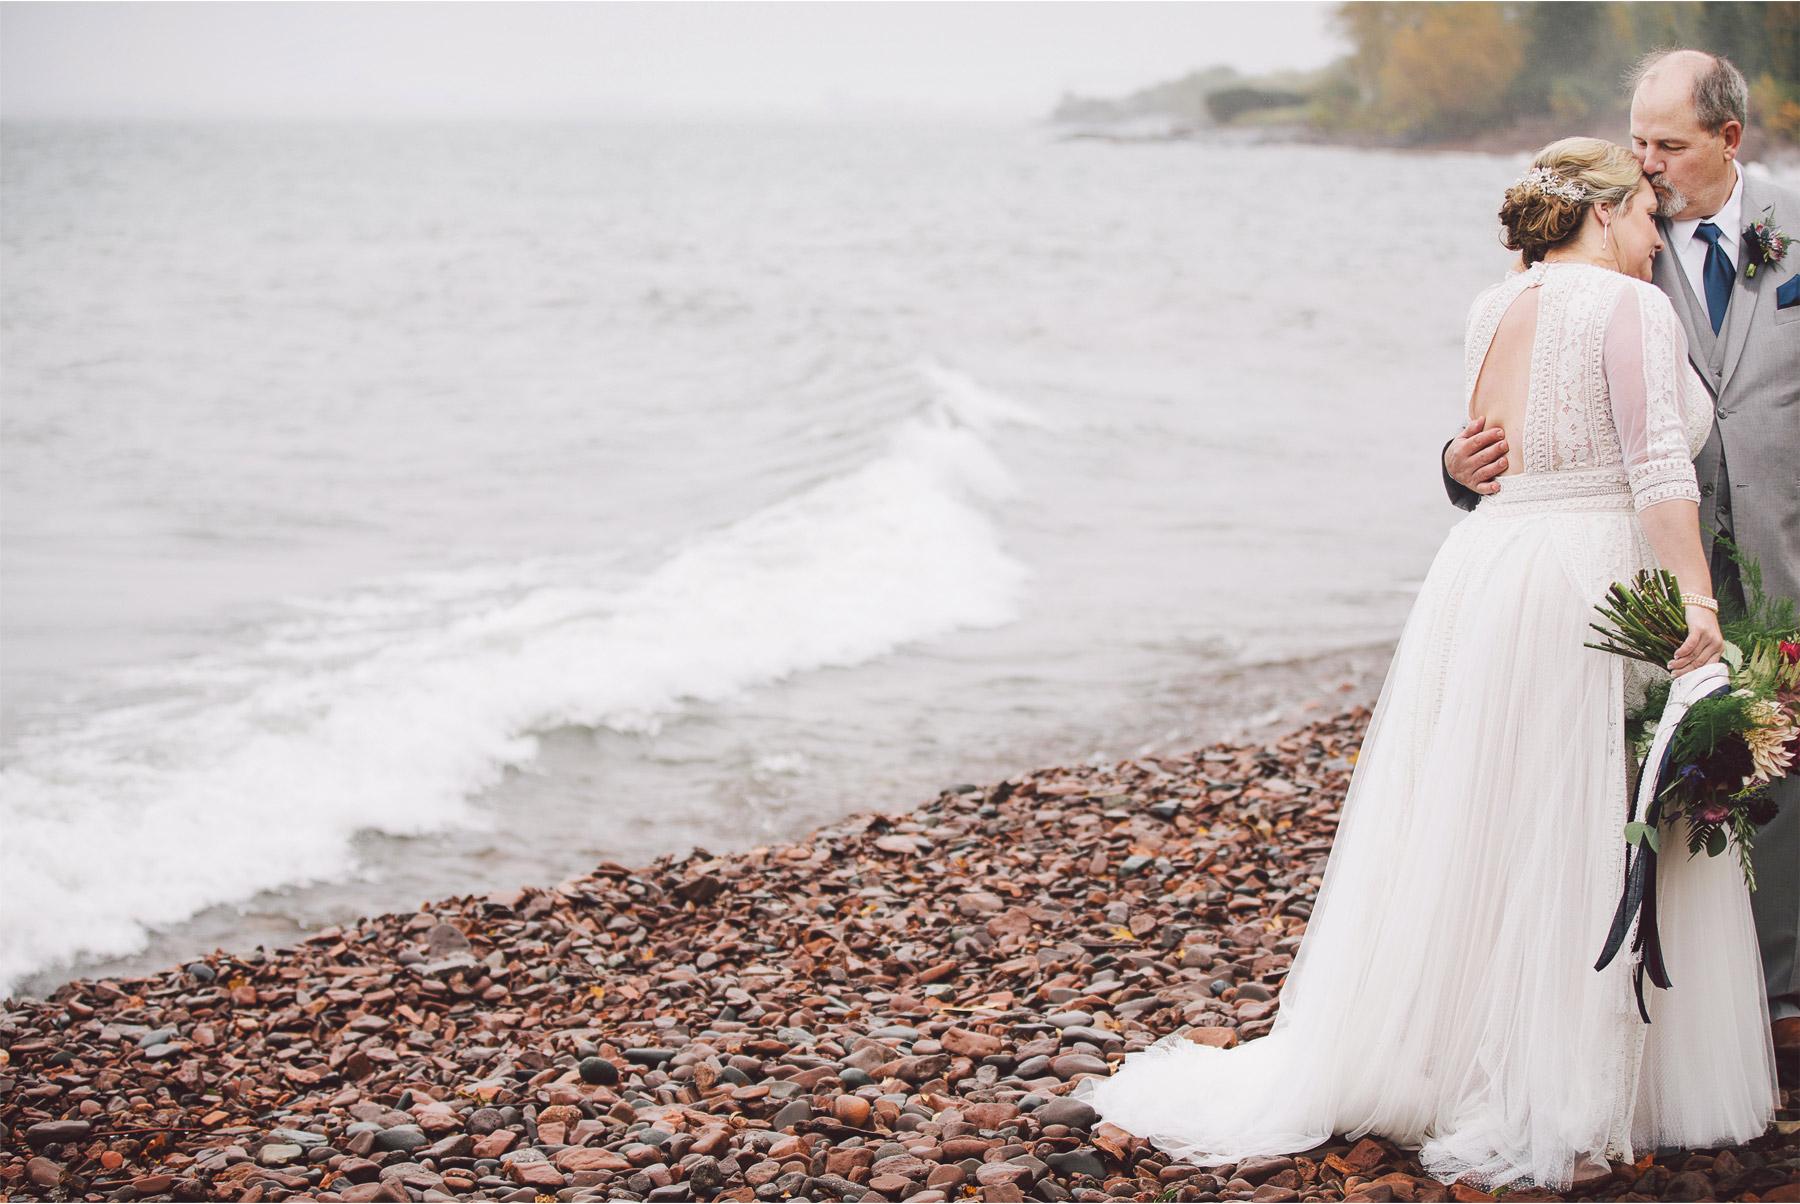 07-Duluth-Minnesota-Wedding-Photography-by-Vick-Photography-Glensheen-Mansion-Rain-Lake-Superior-Kelli-and-Marc.jpg